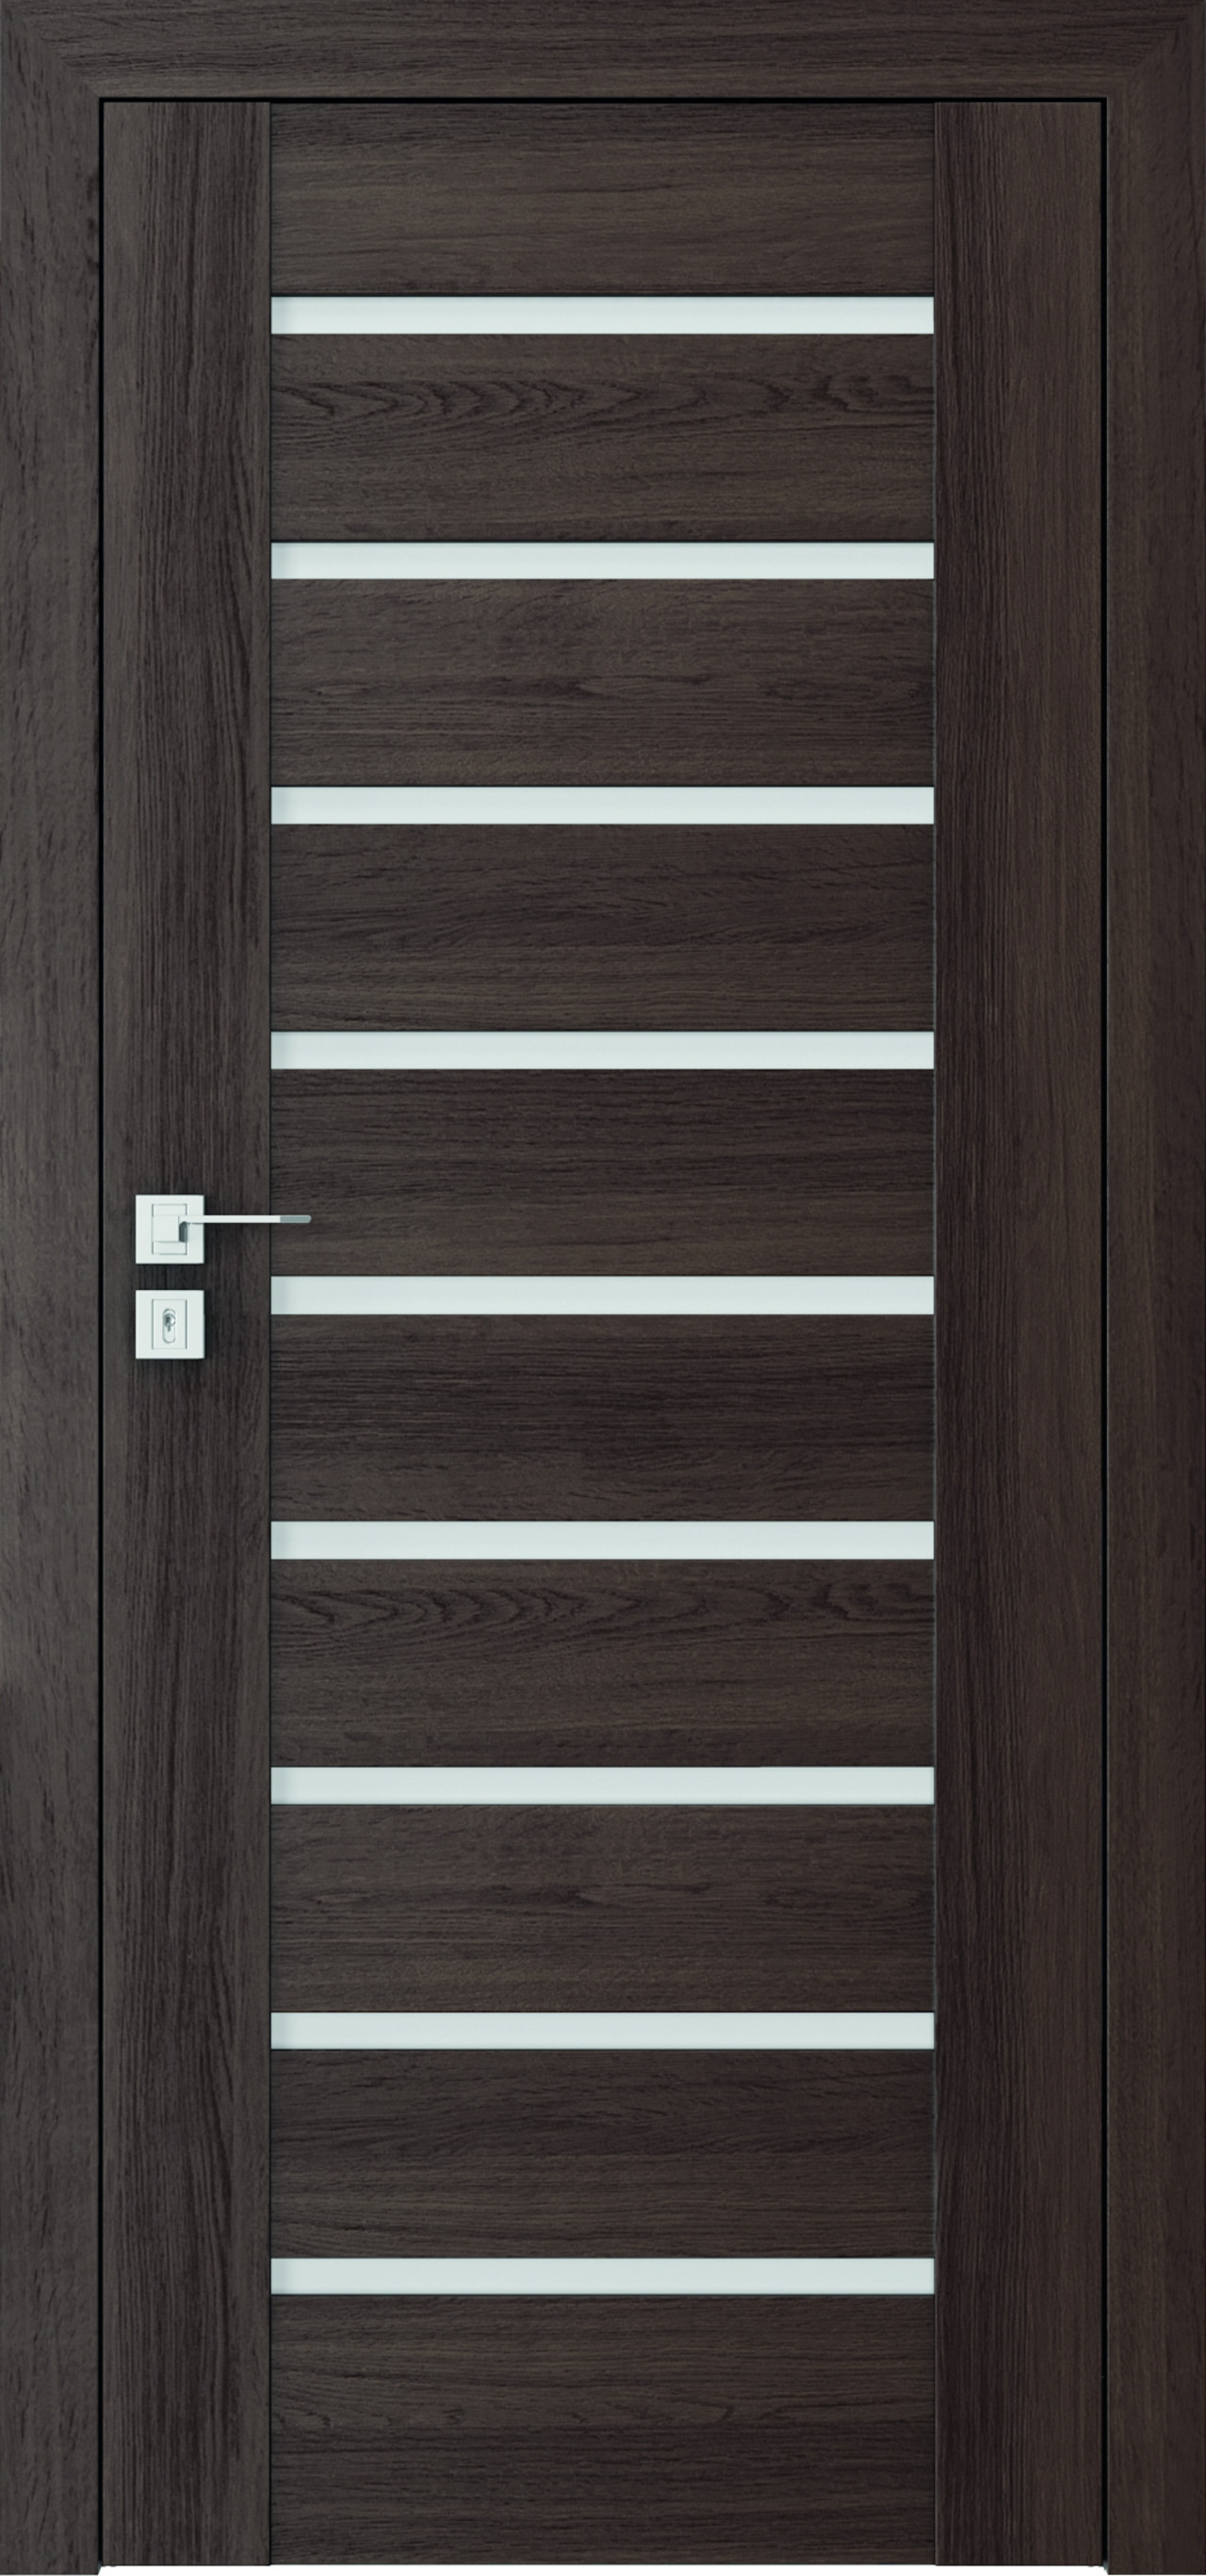 Interiérové dveře Porta Doors Koncept A - Dekor Portaperfect 3D/Premium - Bezfalcové